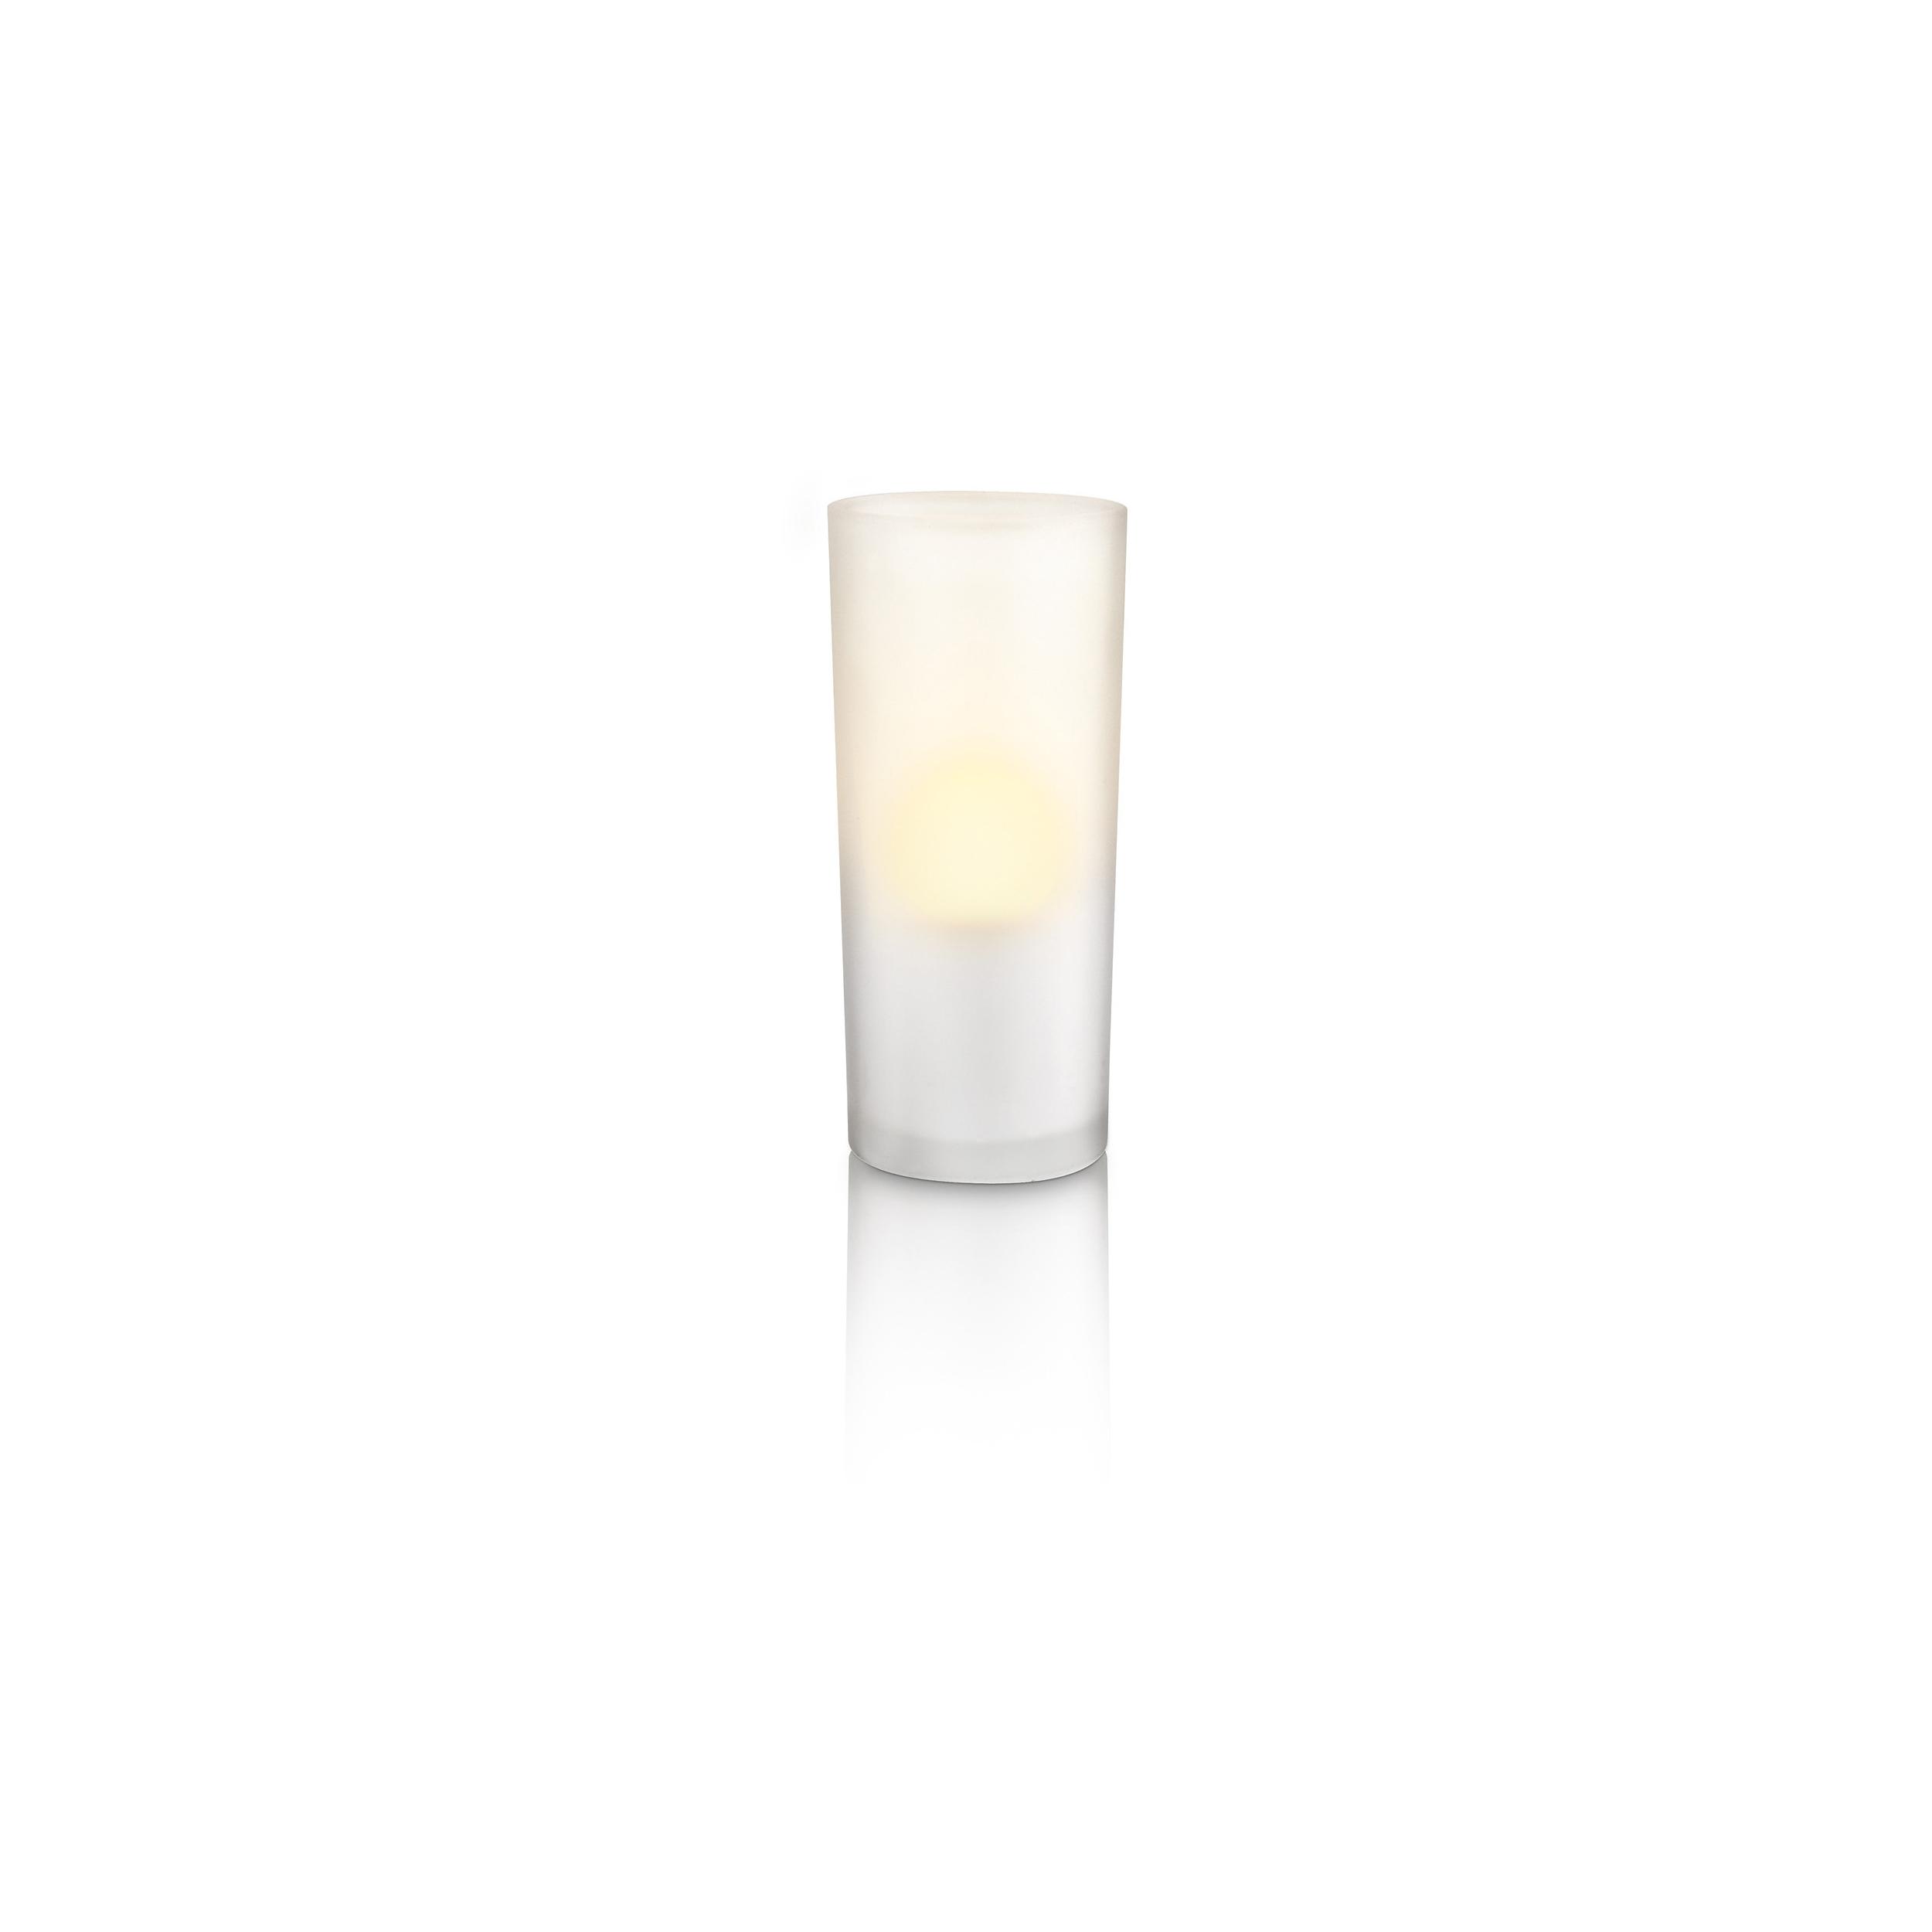 philips led lampe au enbereich candlelights tischleuchte 8w licht 6910860ph ebay. Black Bedroom Furniture Sets. Home Design Ideas